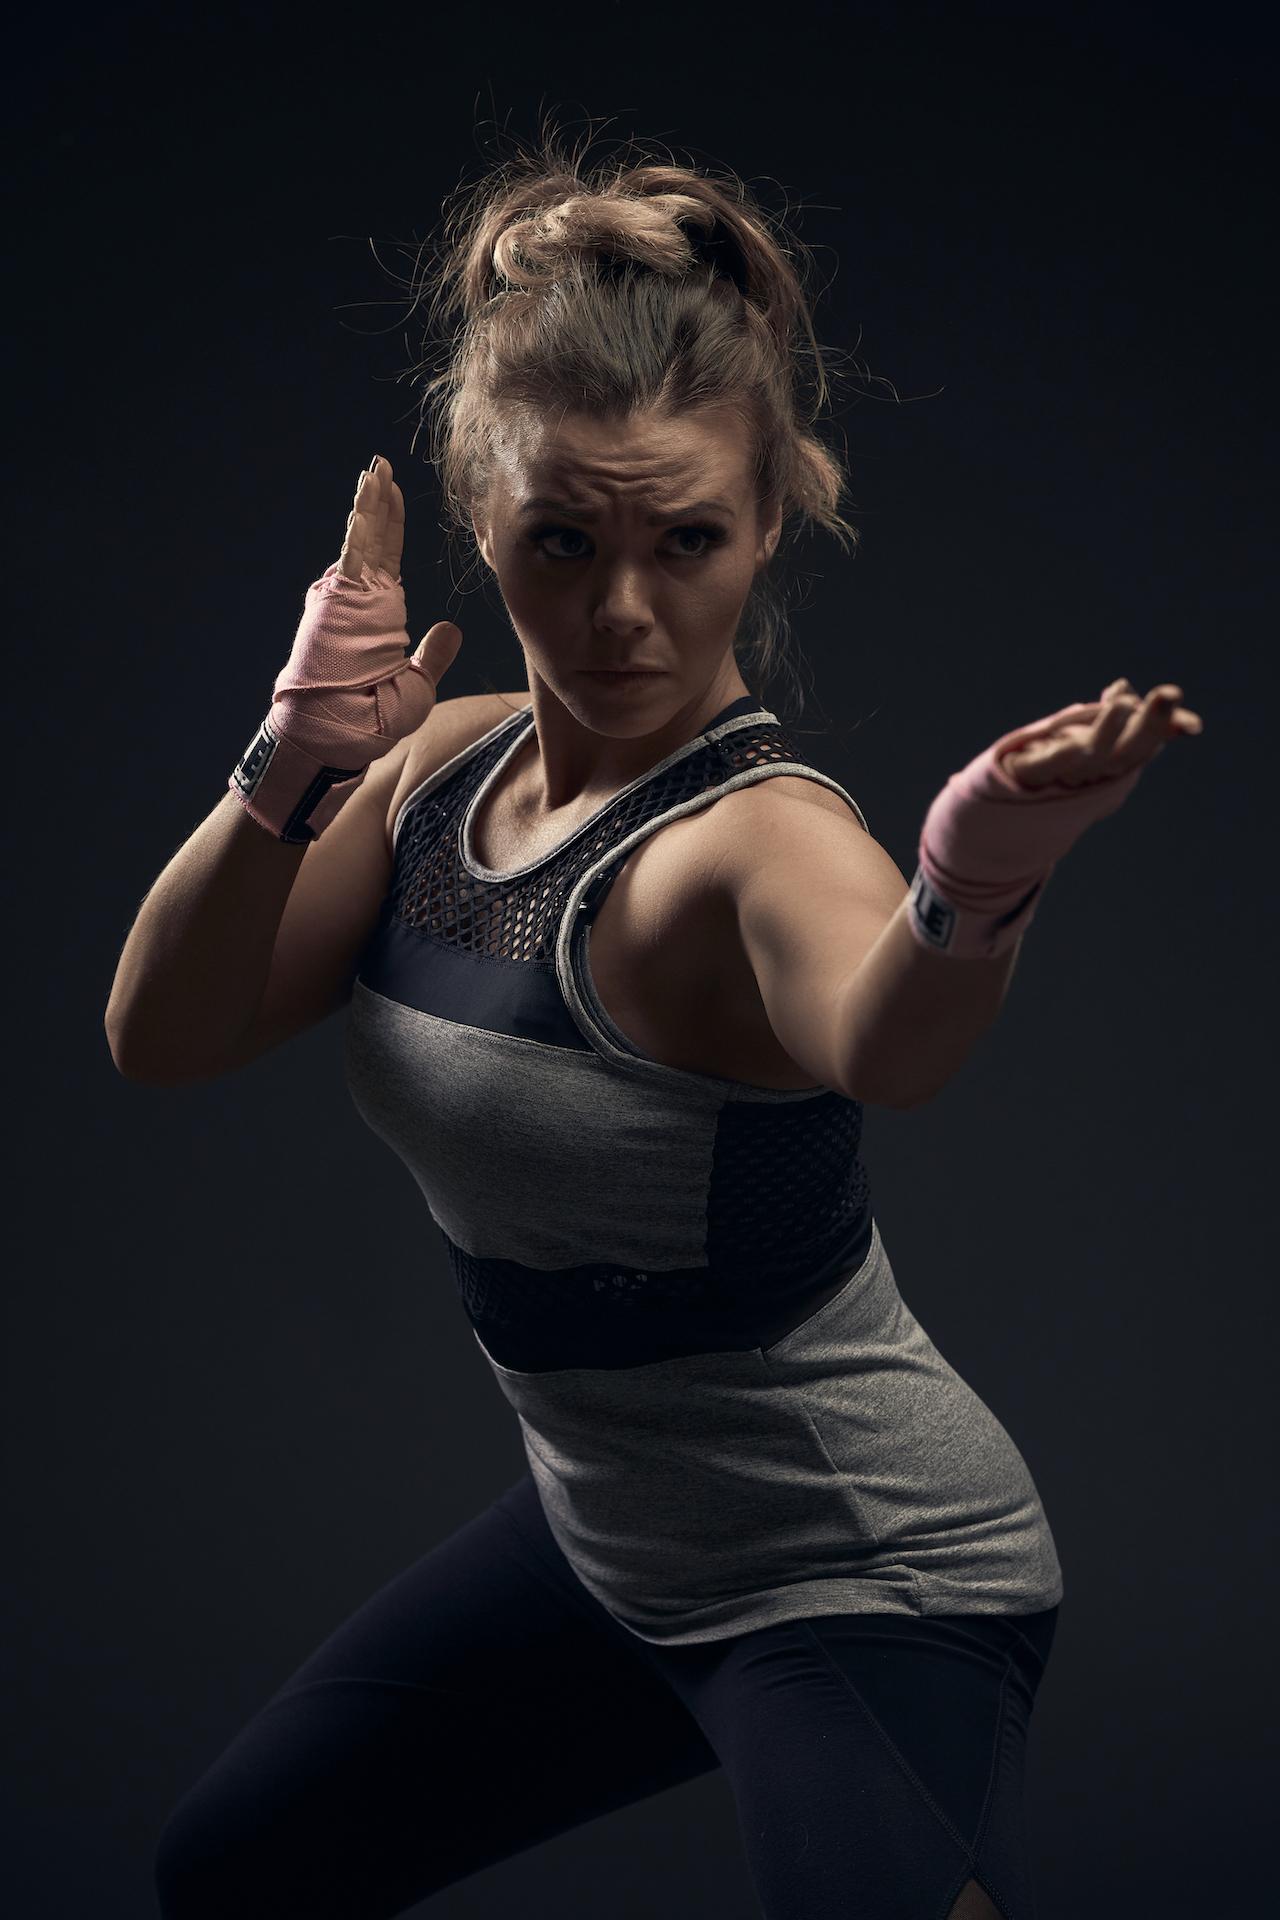 Othentik Gym November 2018 73 copy 2.jpg